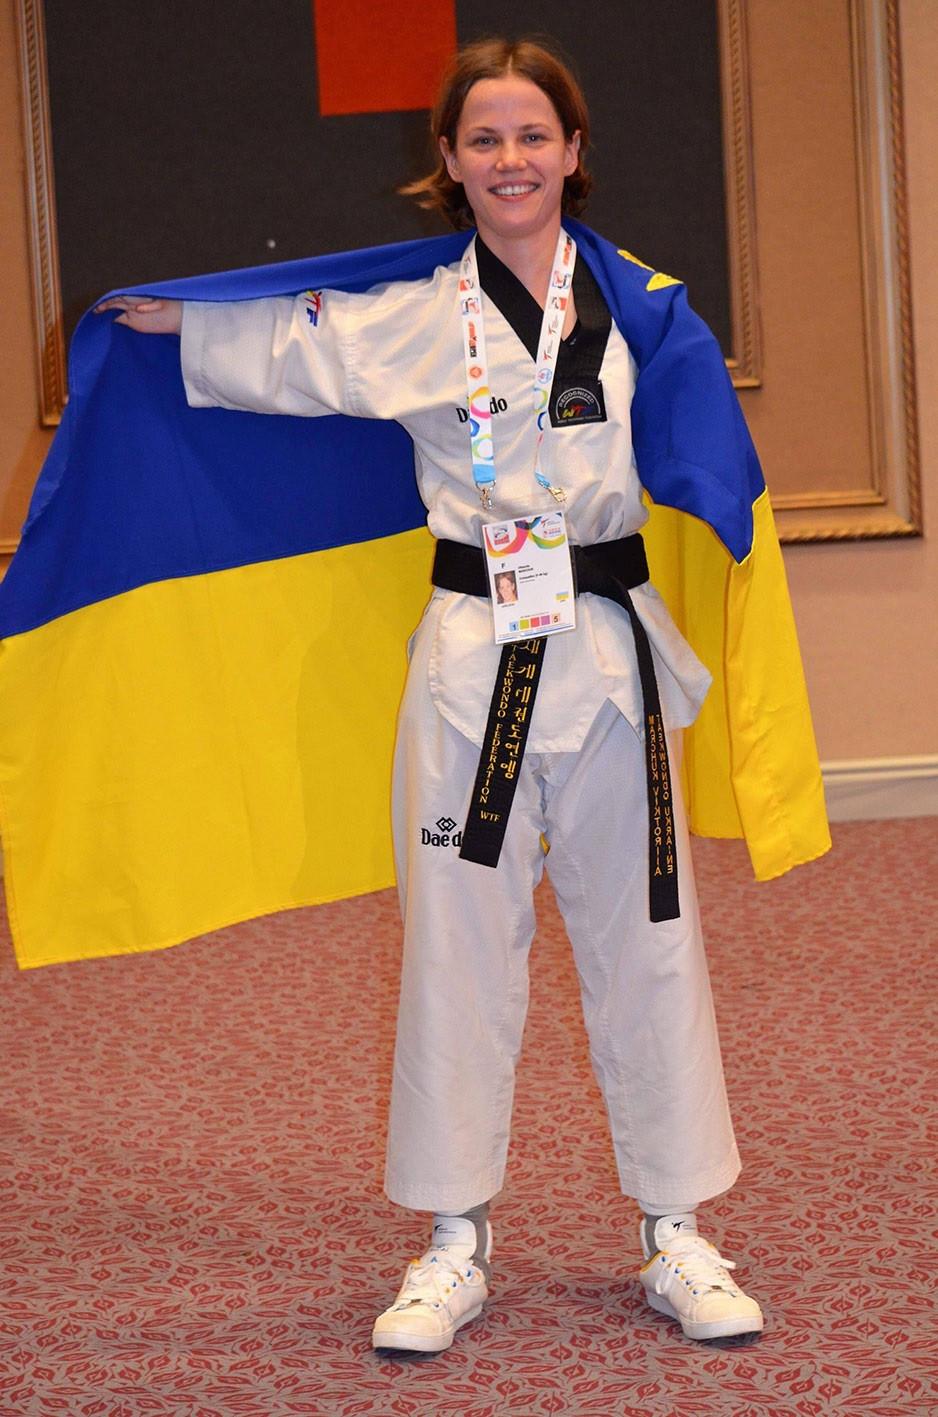 Para-taekwondo pioneer Marchuk receives Merited Master of Sport honour